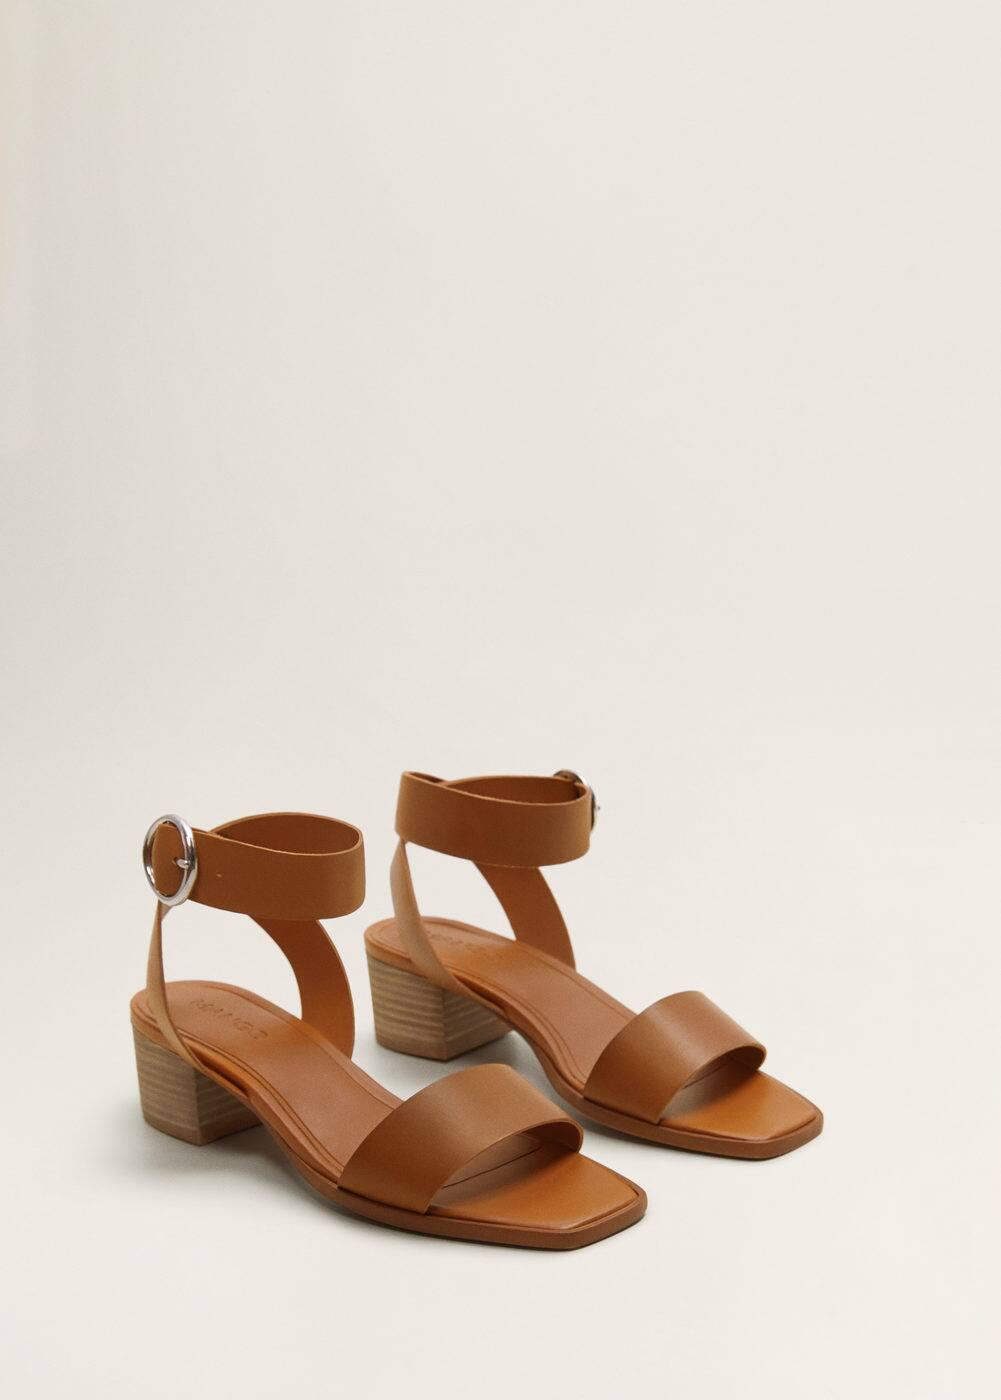 m-gema:sandalia piel pulsera